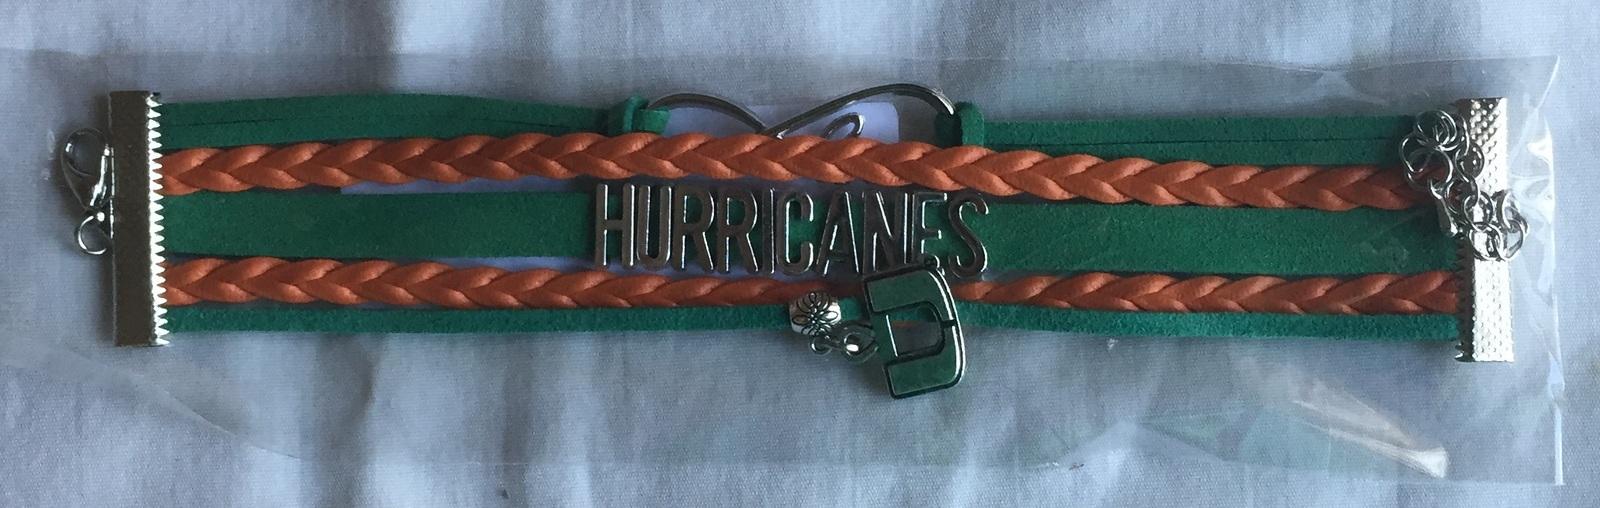 University of Miami Hurricanes Fan Shop Infinity Bracelet Jewelry